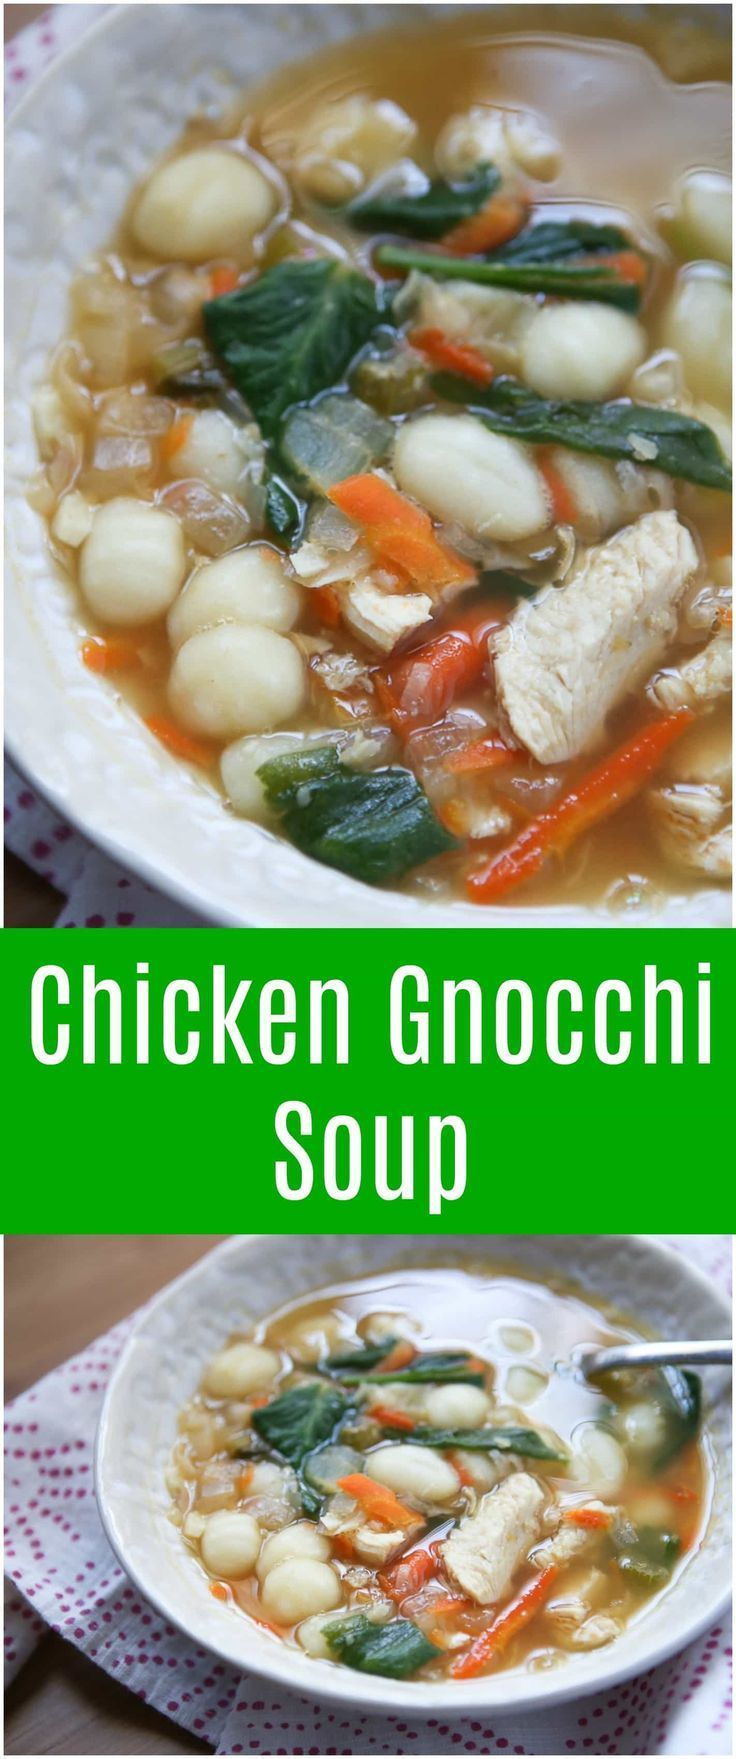 Healthy Chicken Gnocchi Soup Recipe Chicken gnocchi